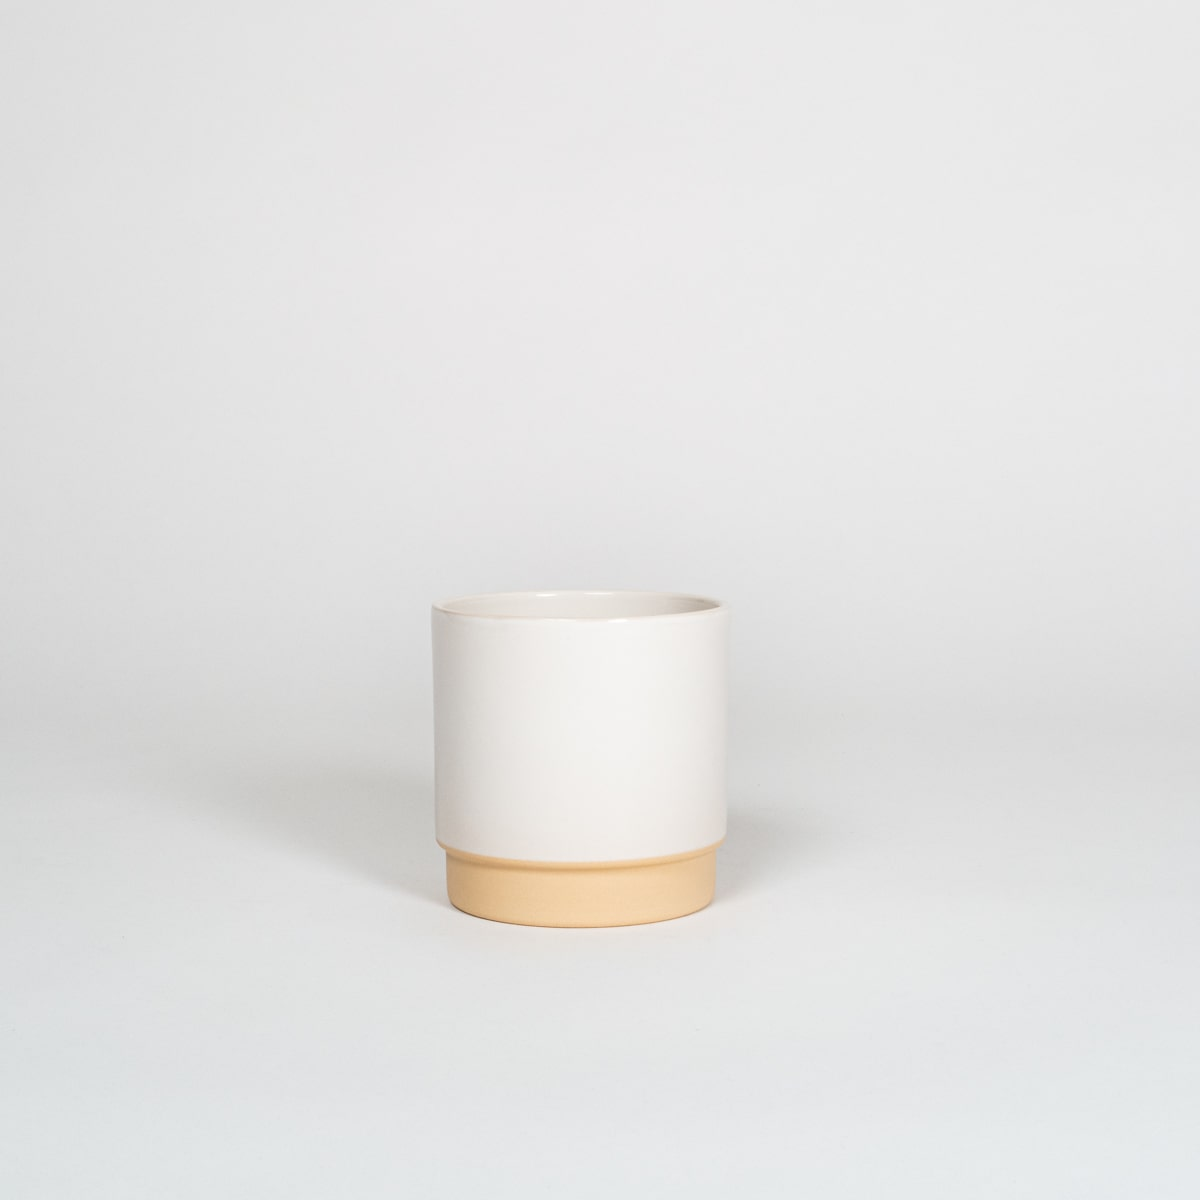 Bloom Flower Delivery | Polar White Ceramic Plant Pot